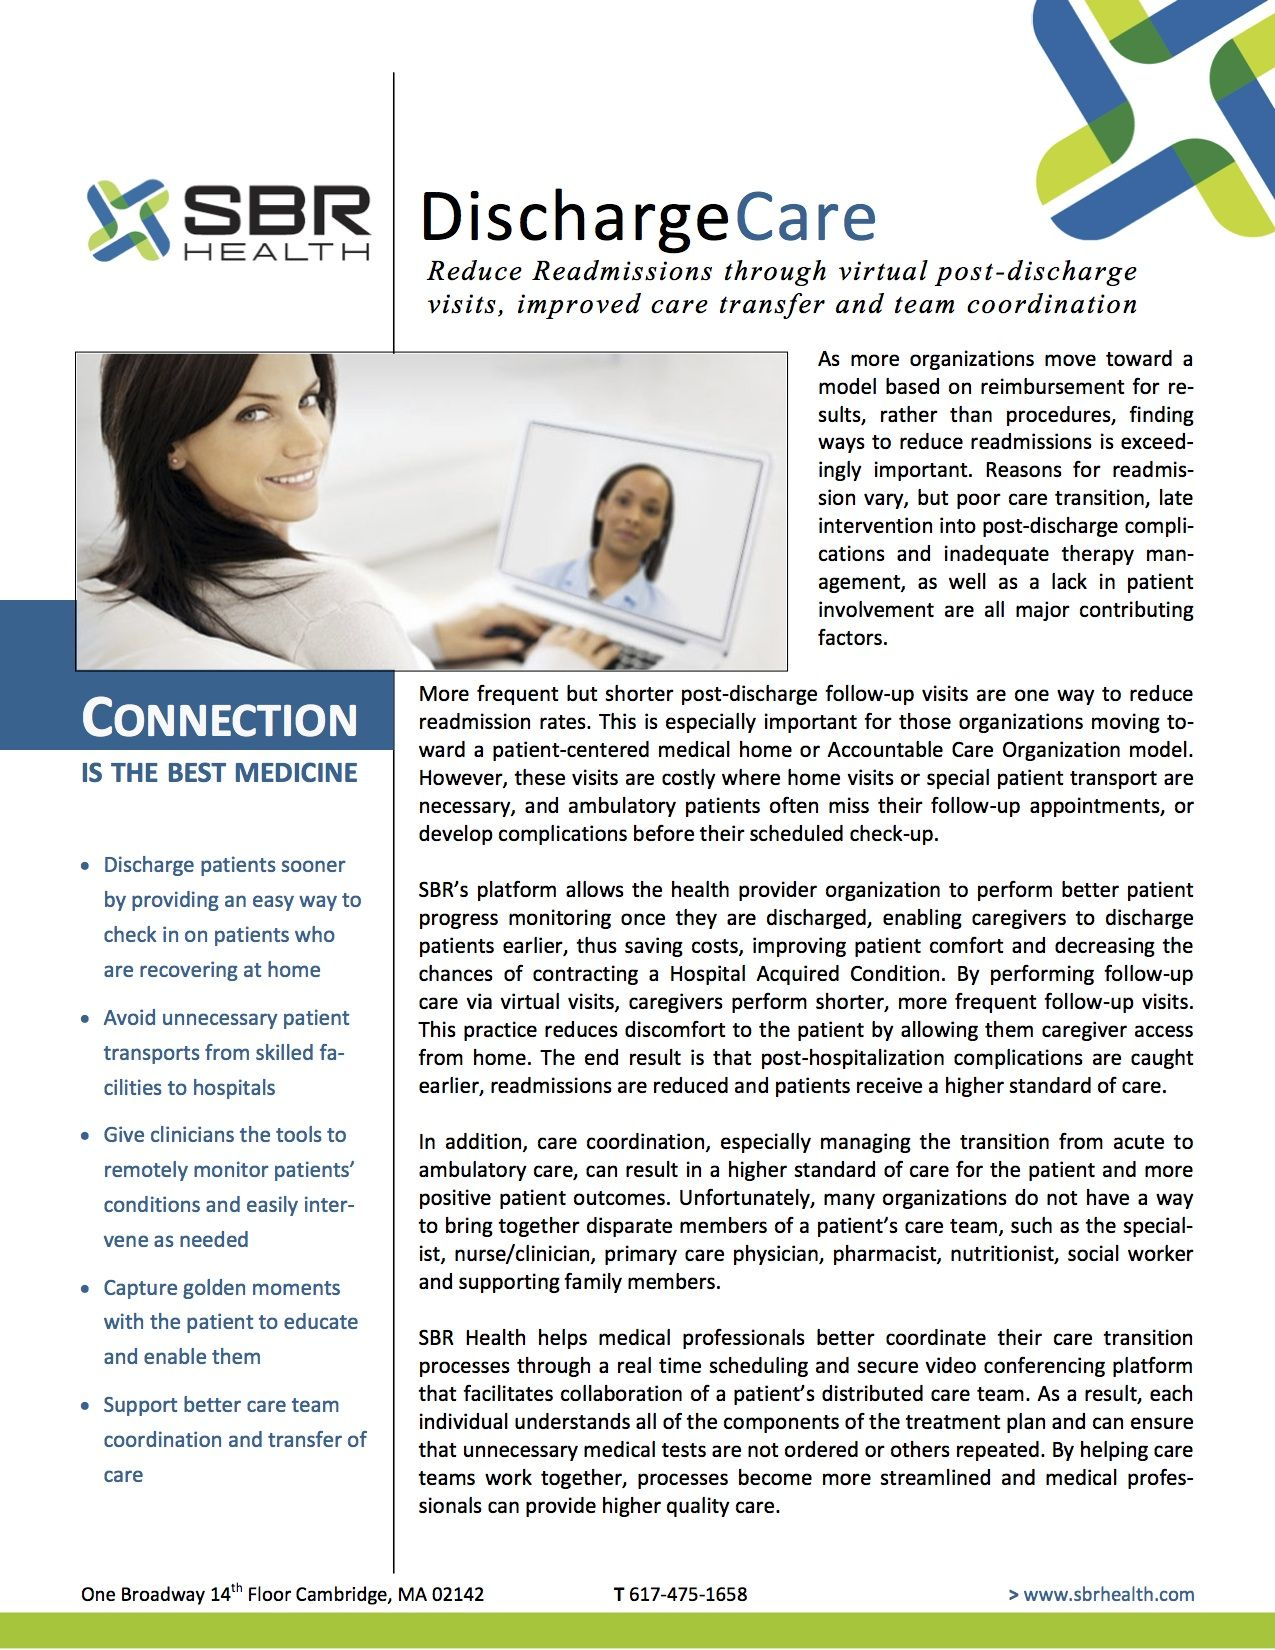 Reduce readmissions through virtual postdischarge visits